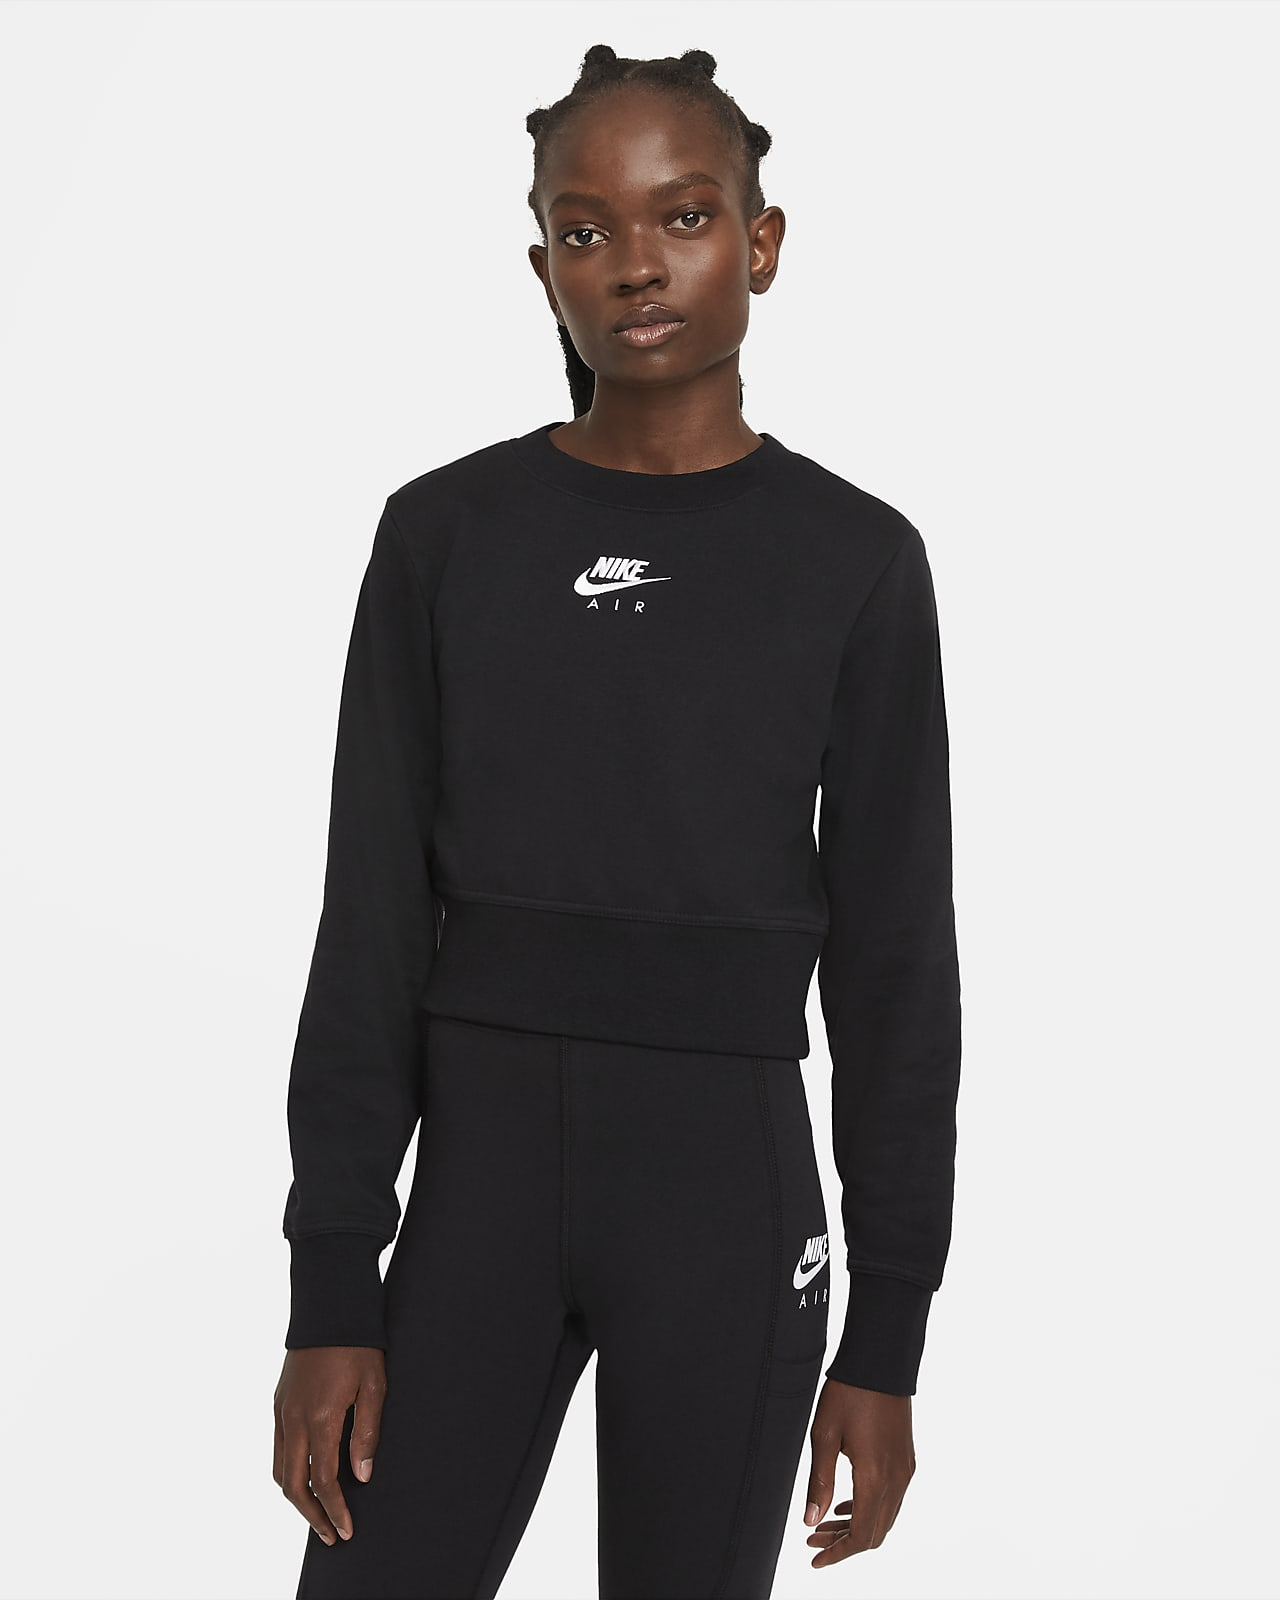 Nike Air Damestop met ronde hals